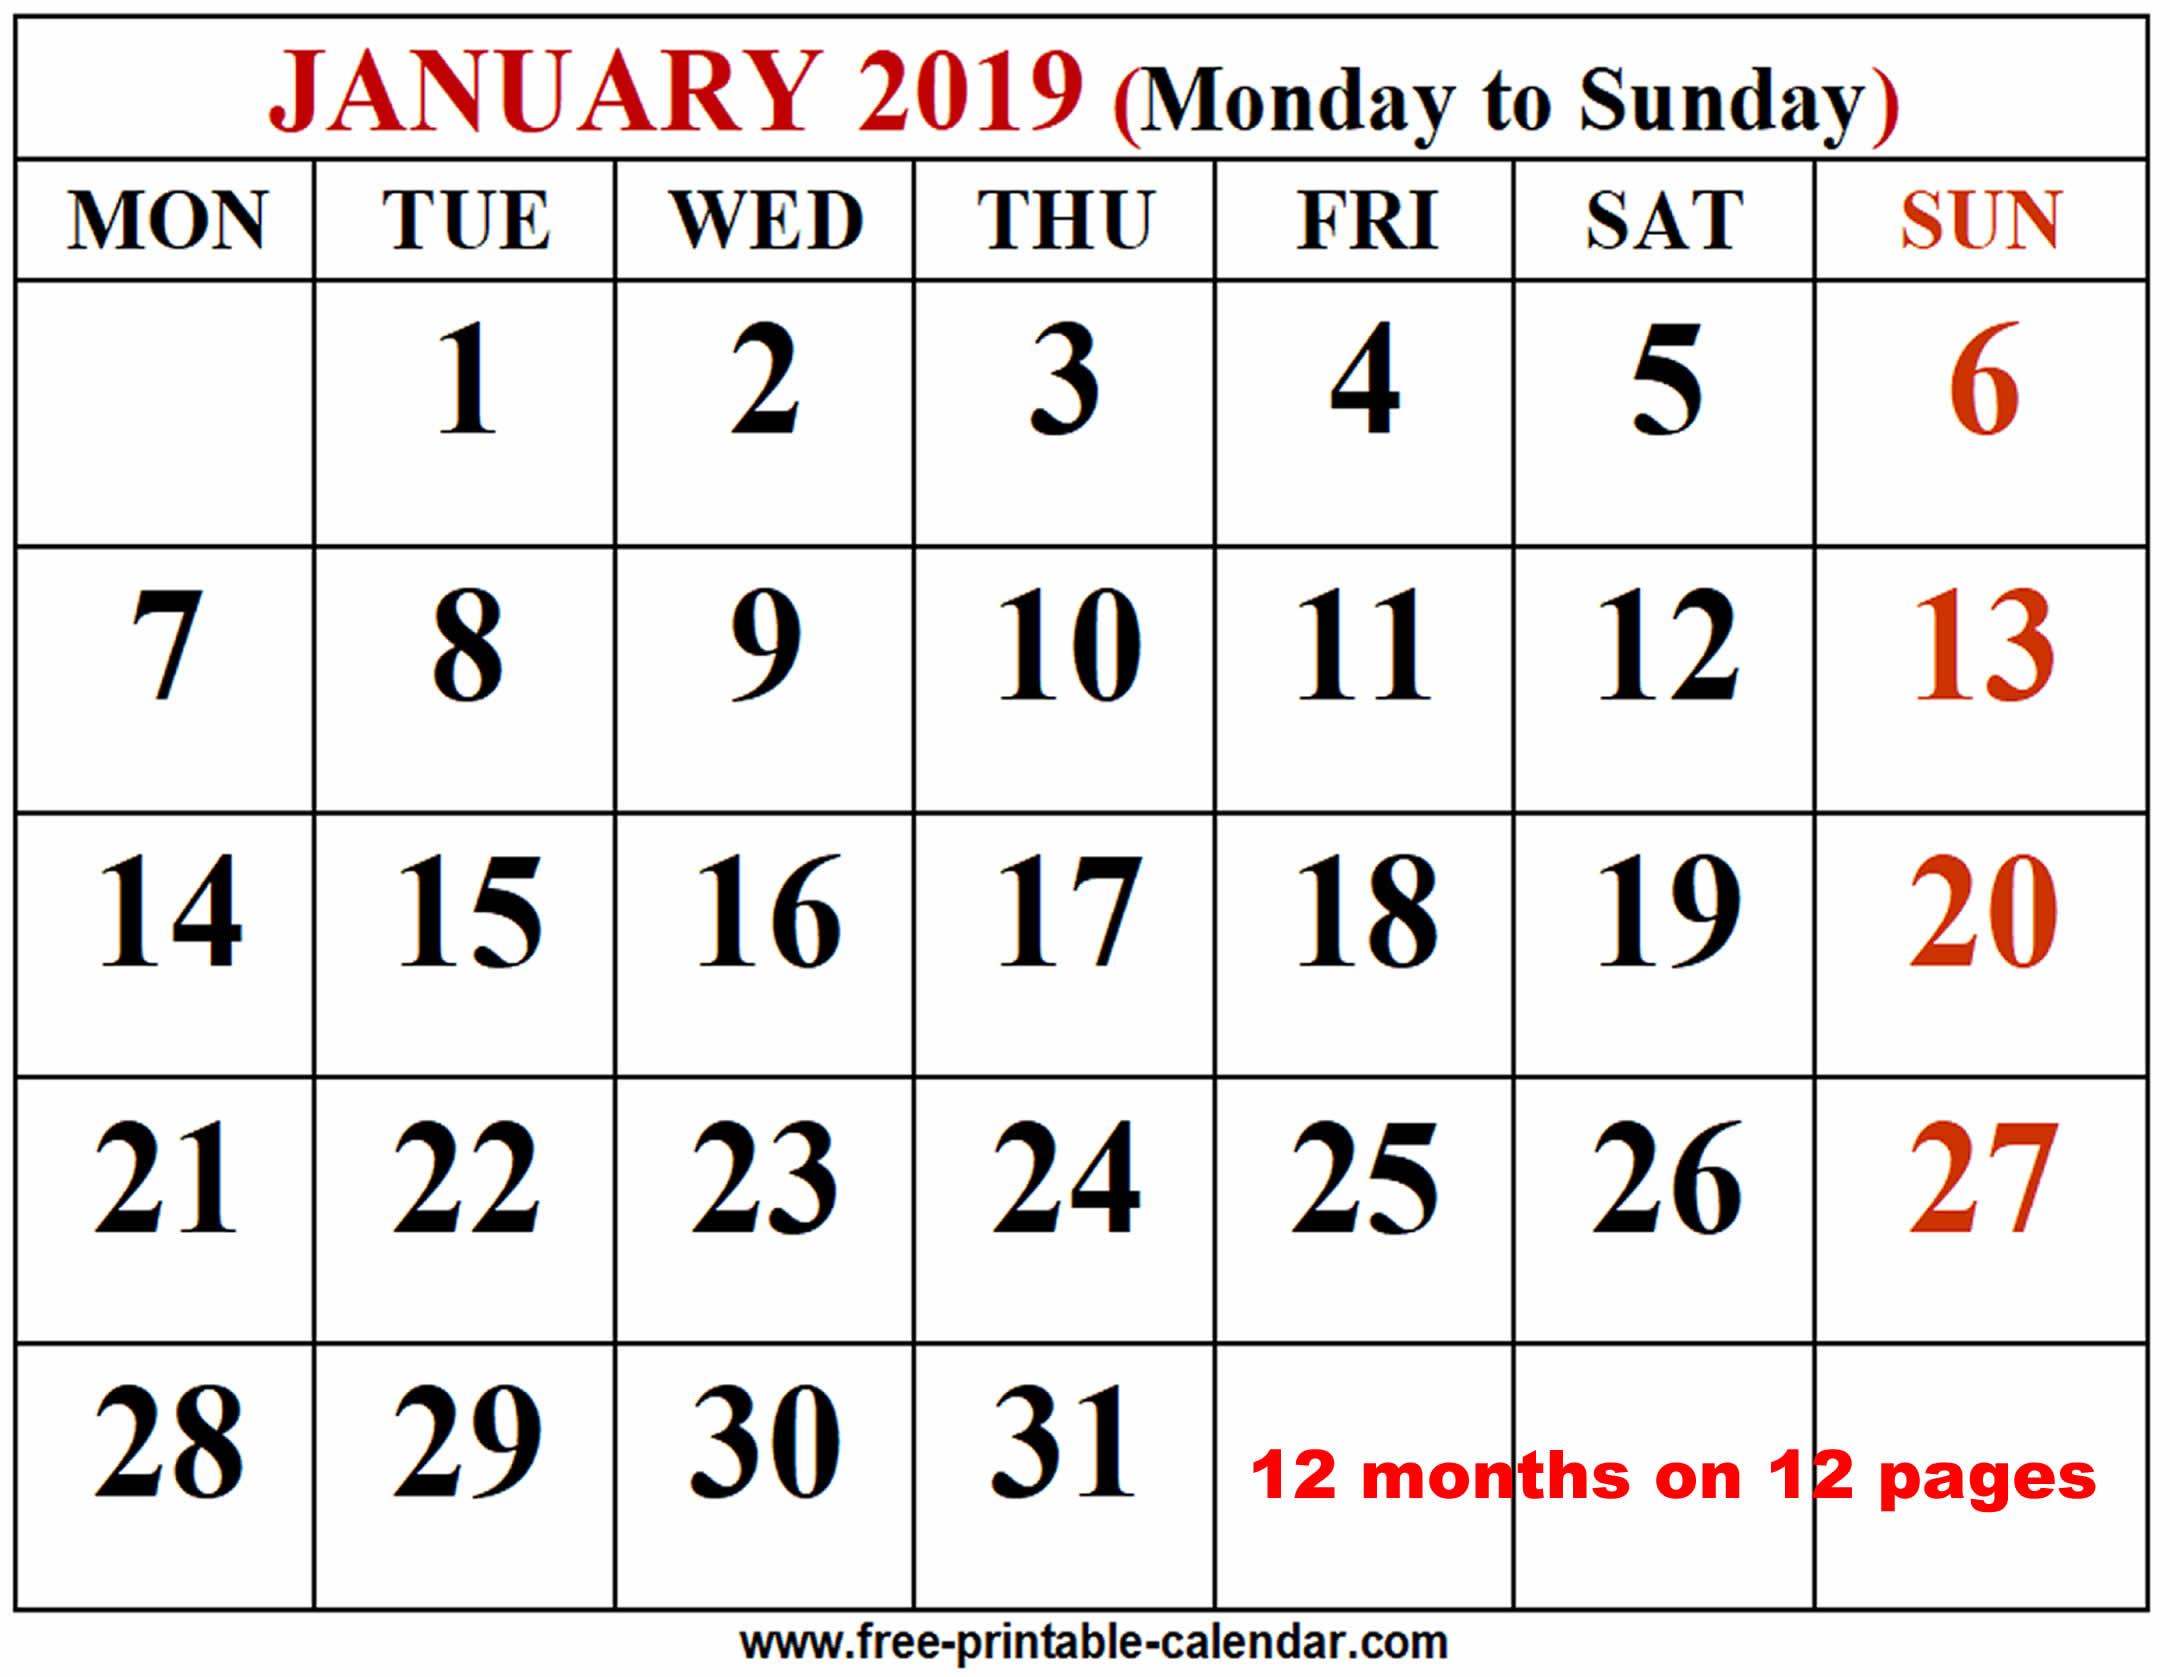 2019 Calendar Template - Free-Printable-Calendar in Monday Through Friday Calendar Template January Printable